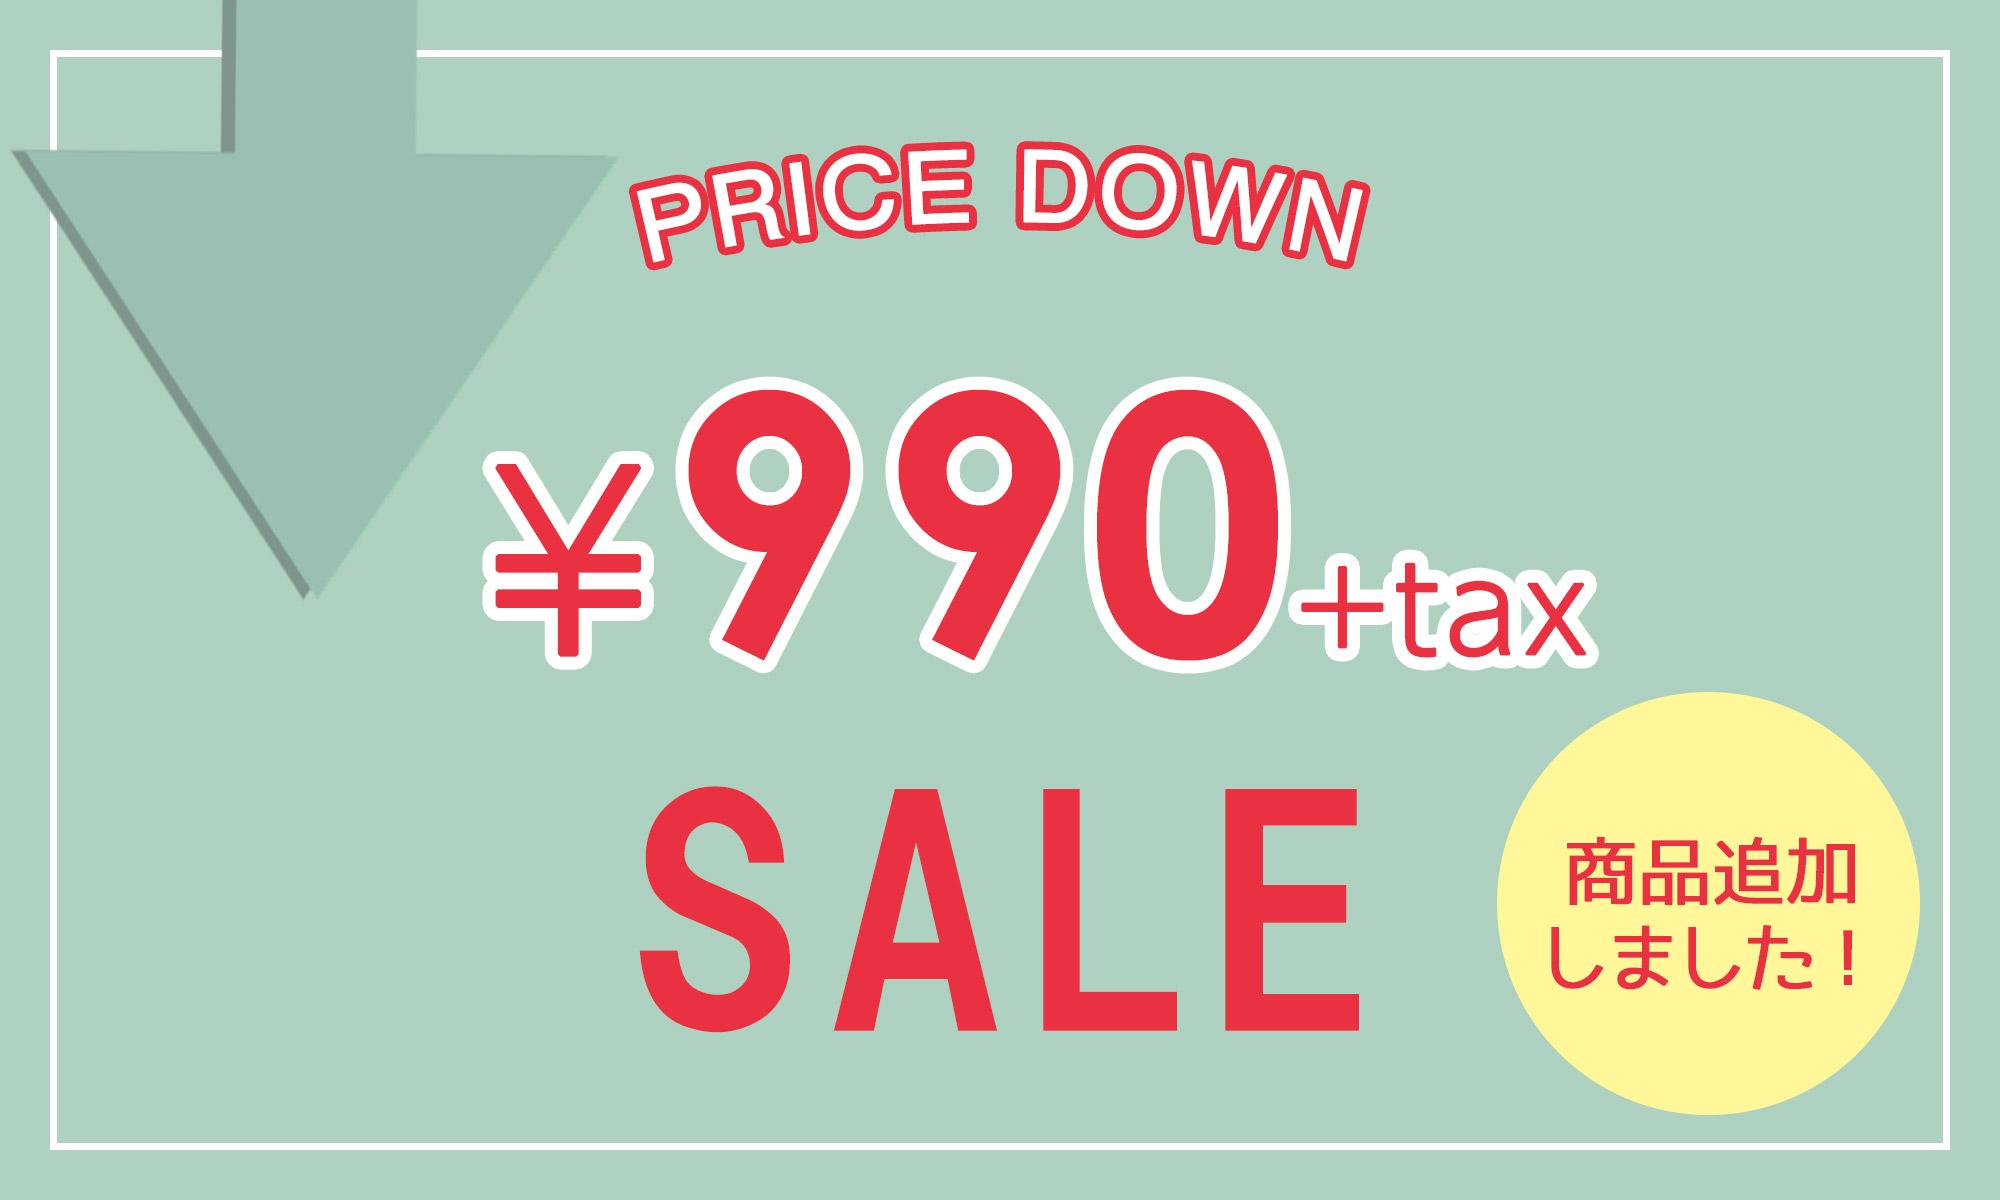 https://www.makeshop.jp/ssl/?ssltype=ssl_shop_member_entry&k=Z29yZ2V8